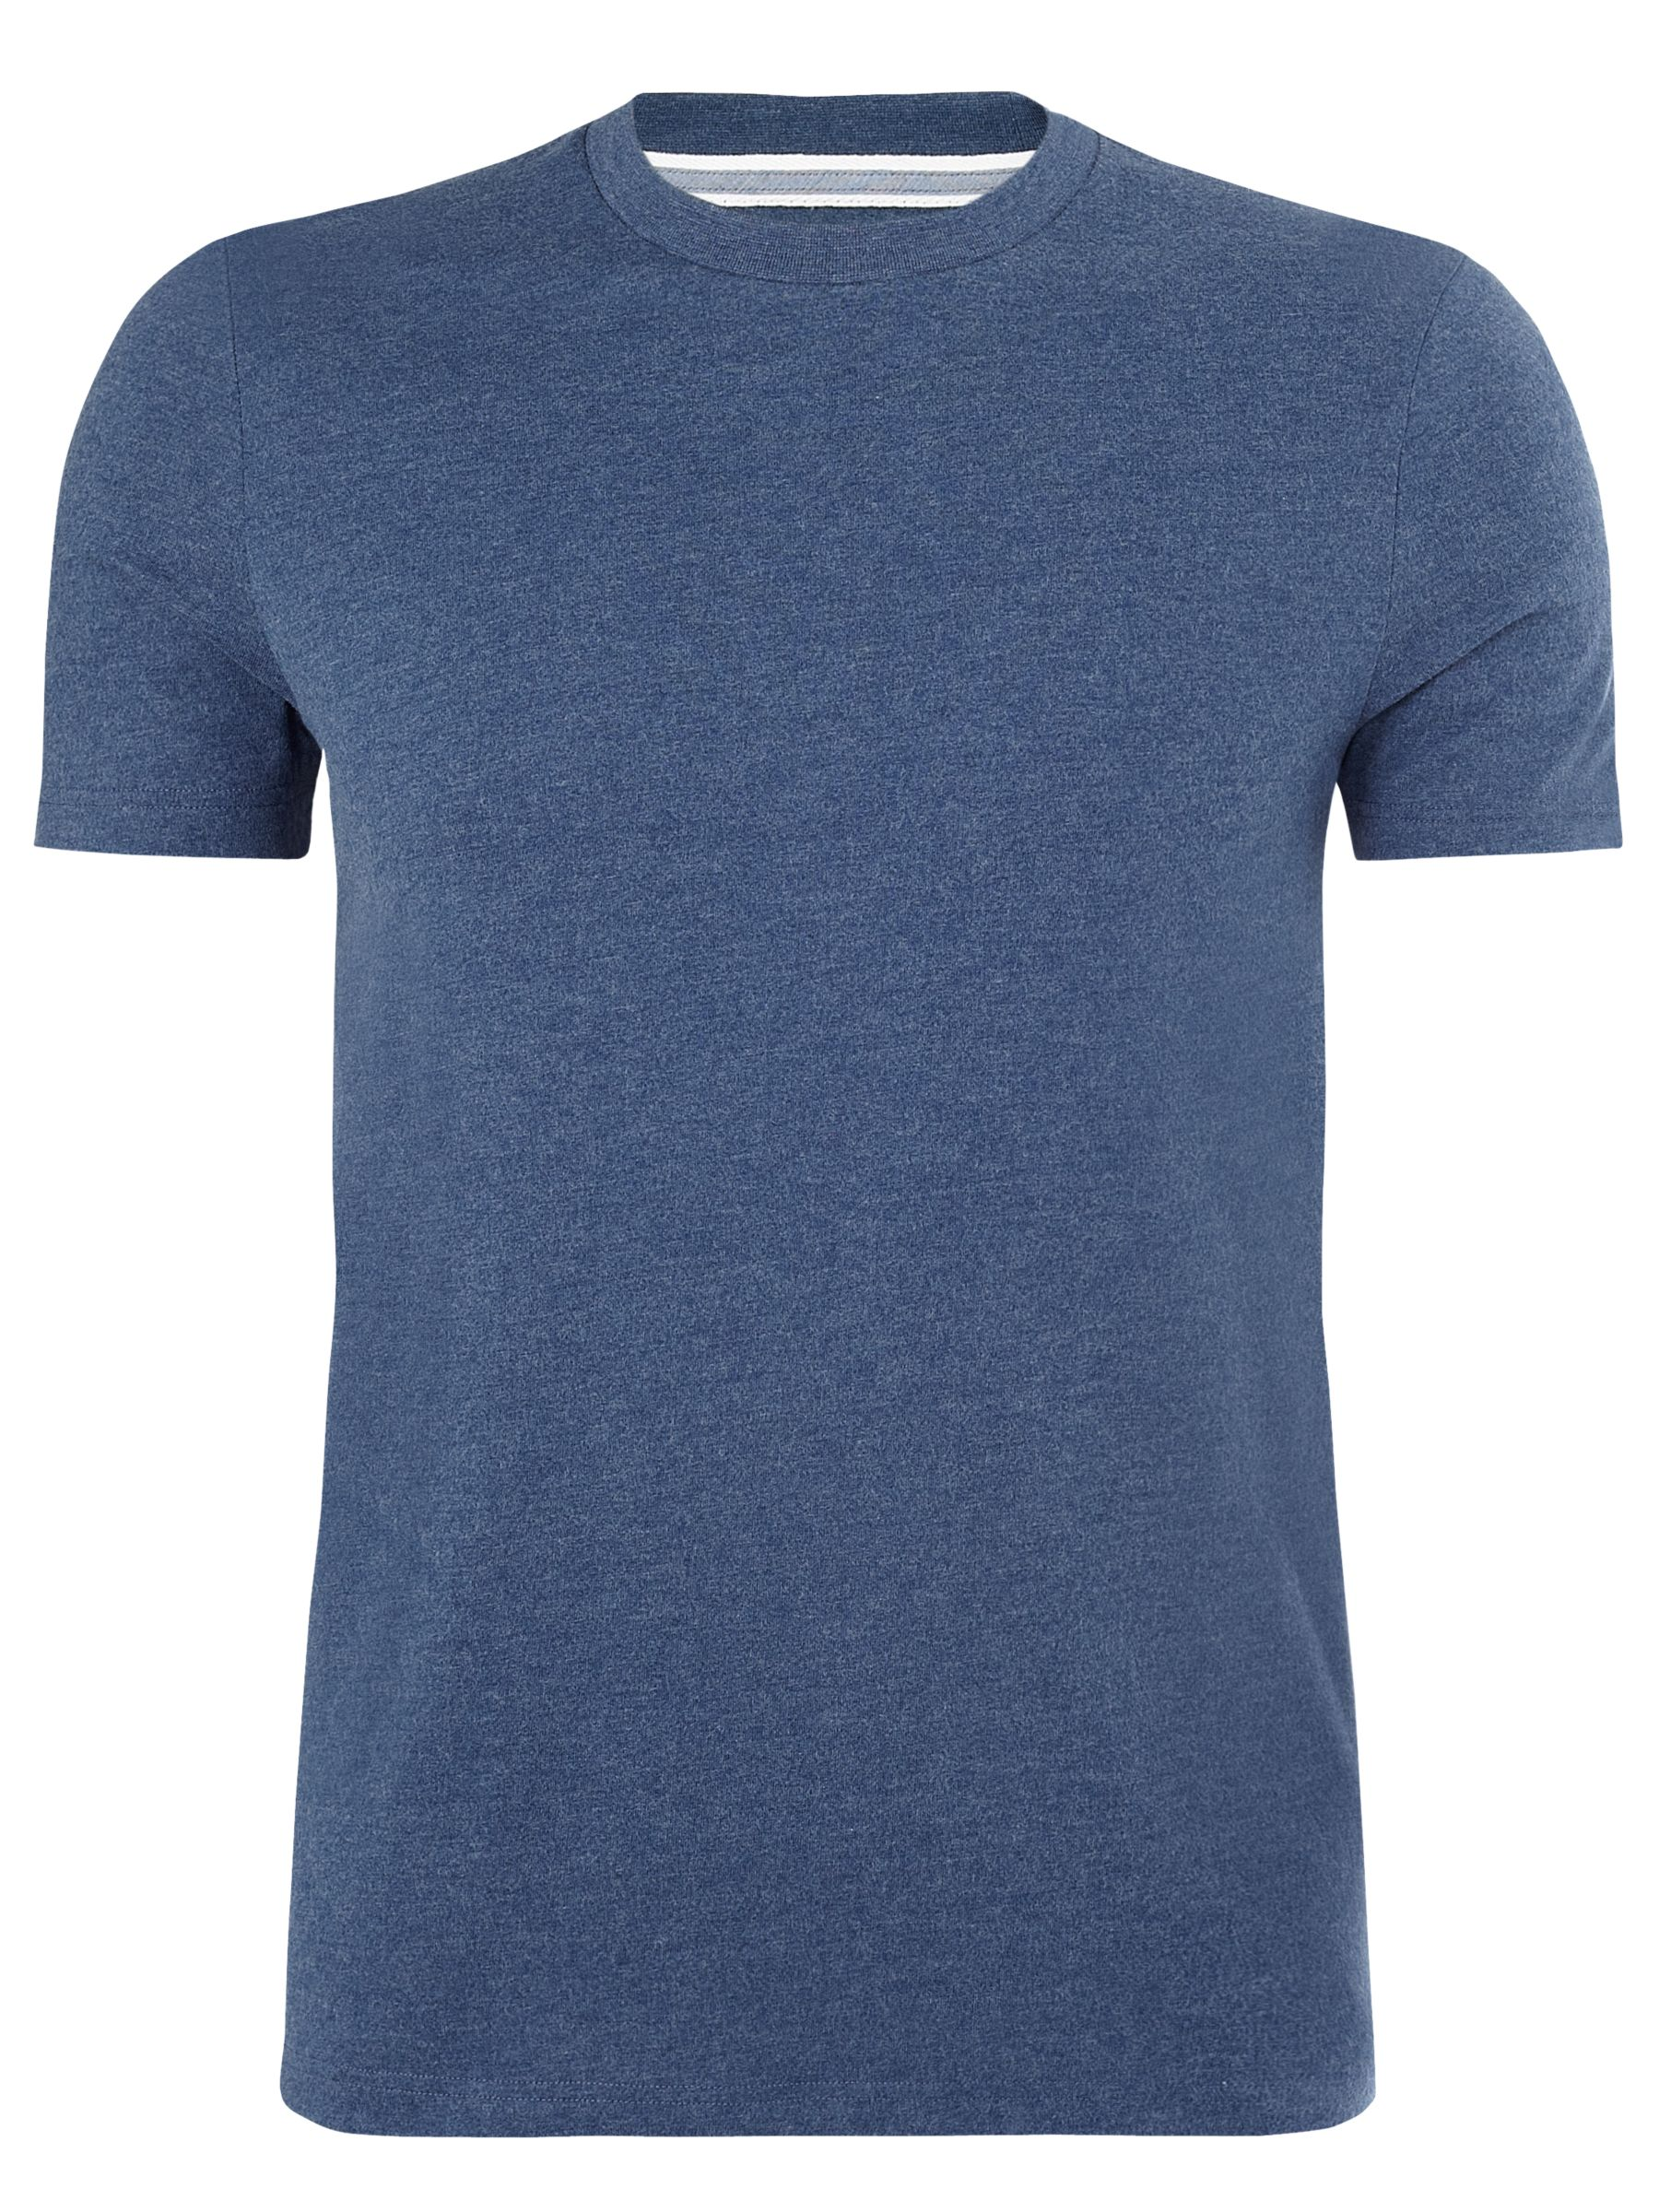 John Lewis Plain T-Shirt, Navy